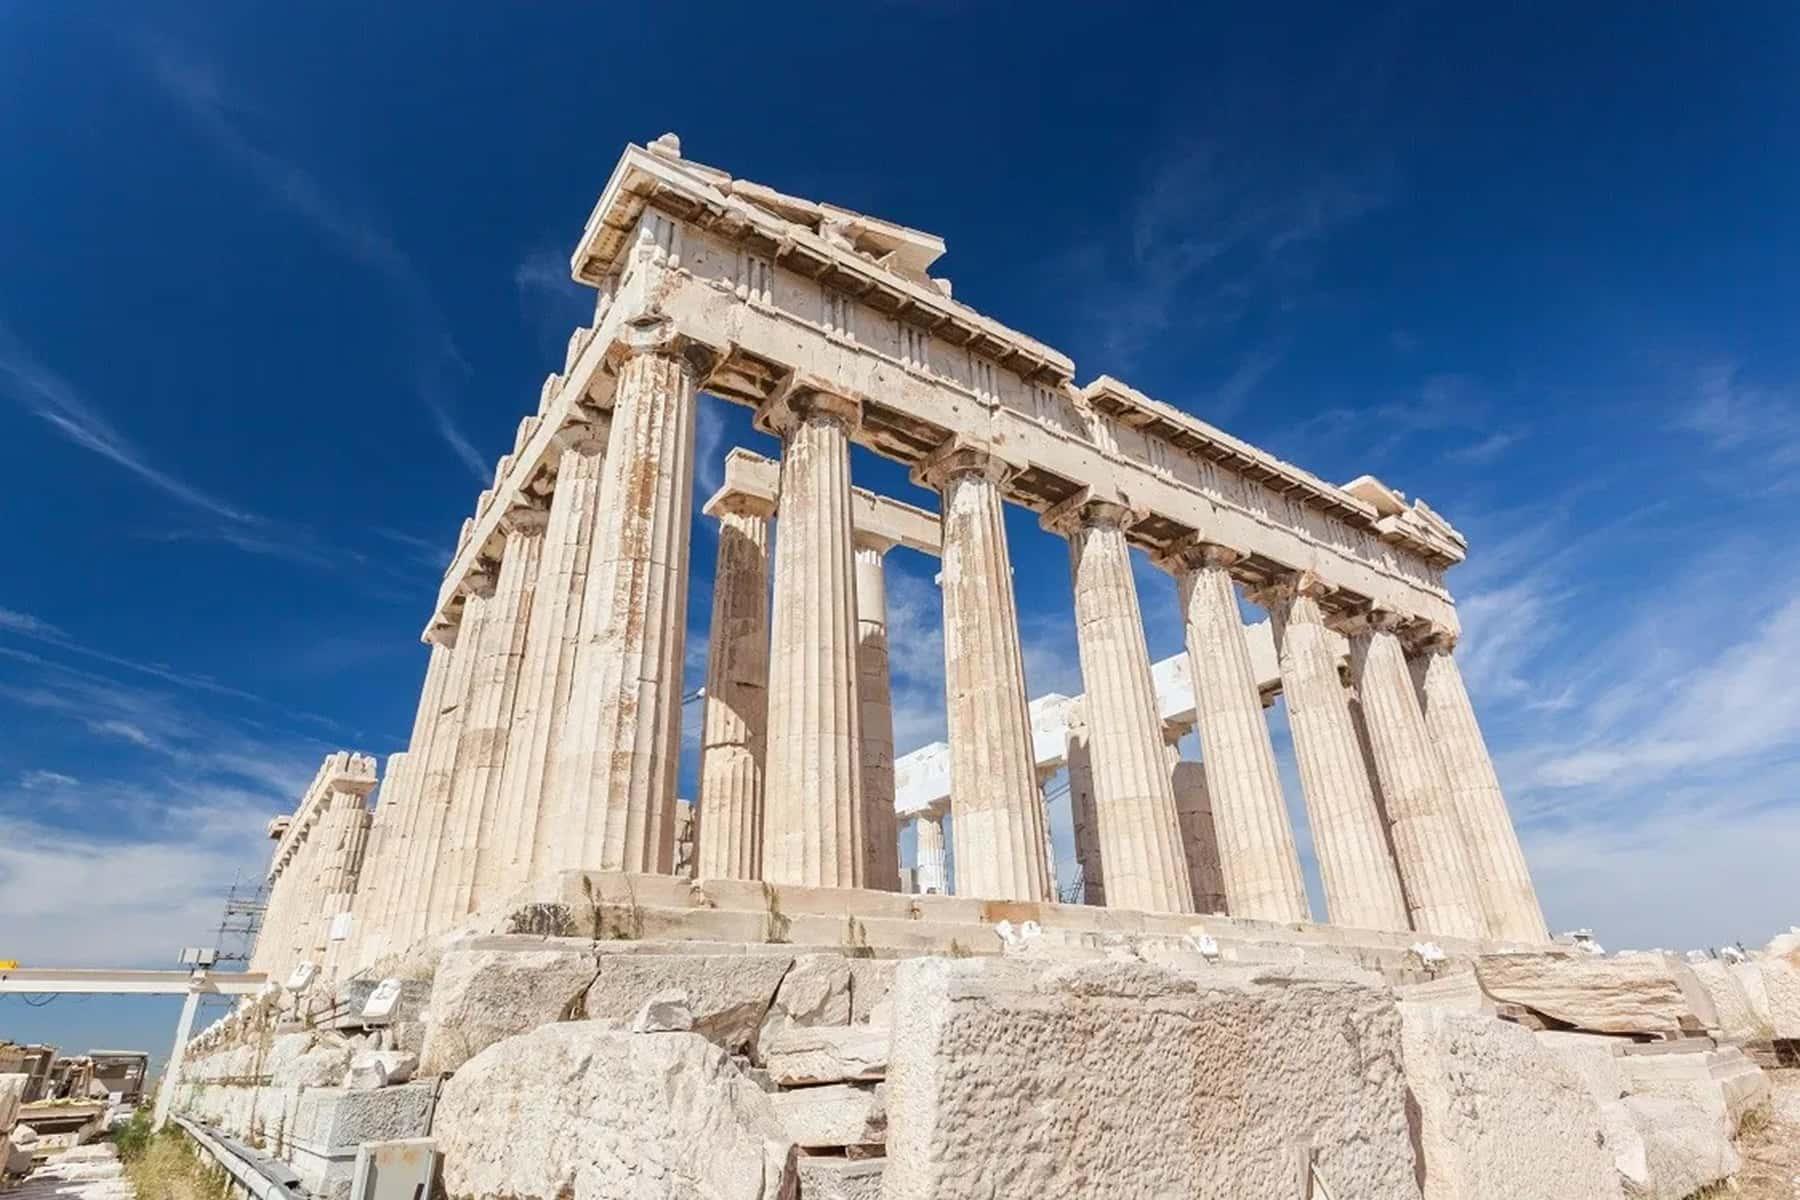 022502_ancientgreeks_02